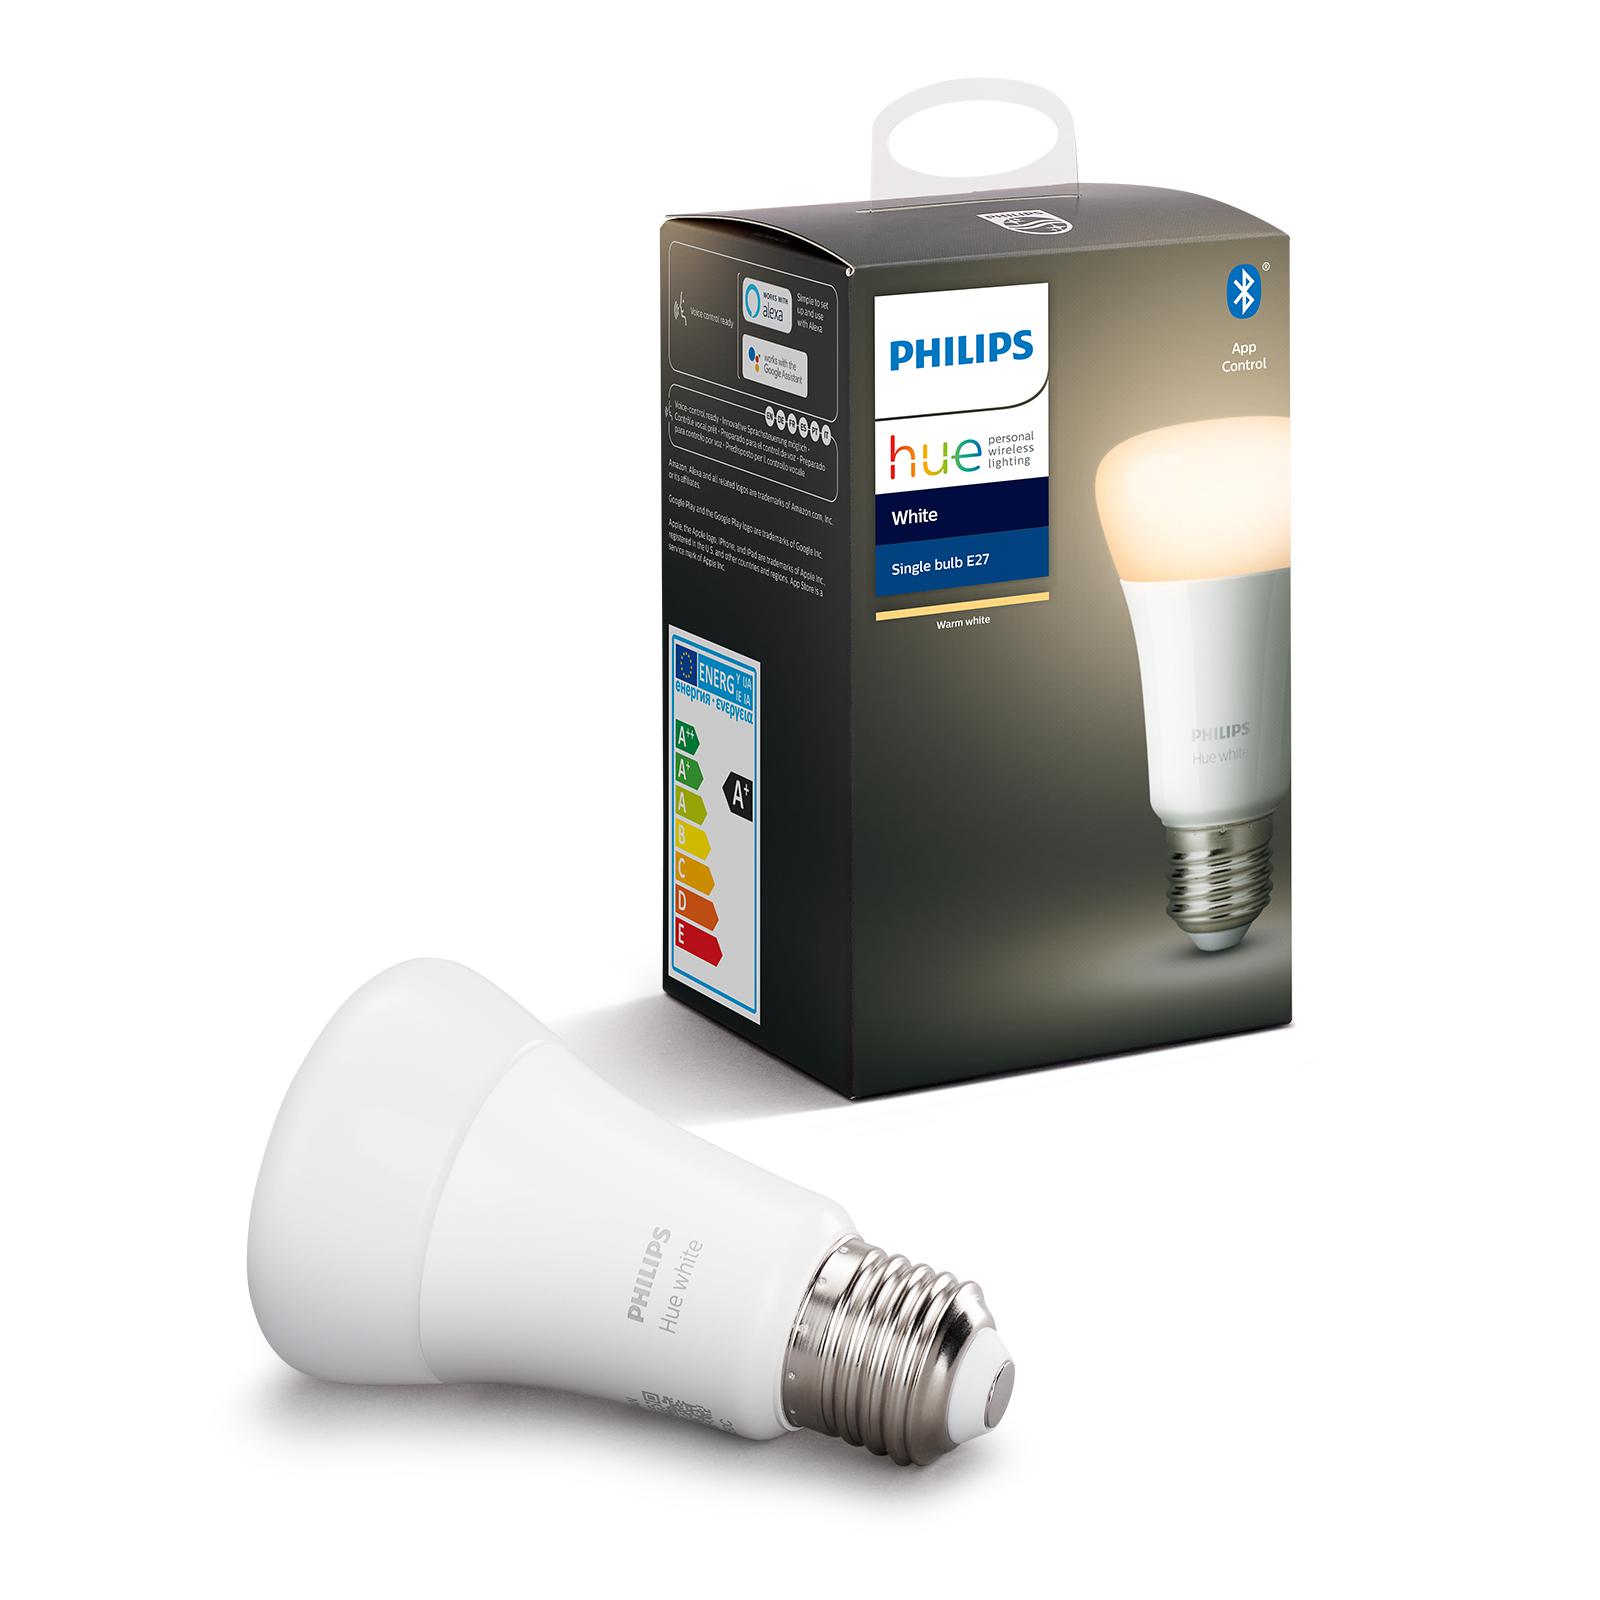 Philips Hue White 9W E27 ampoule LED